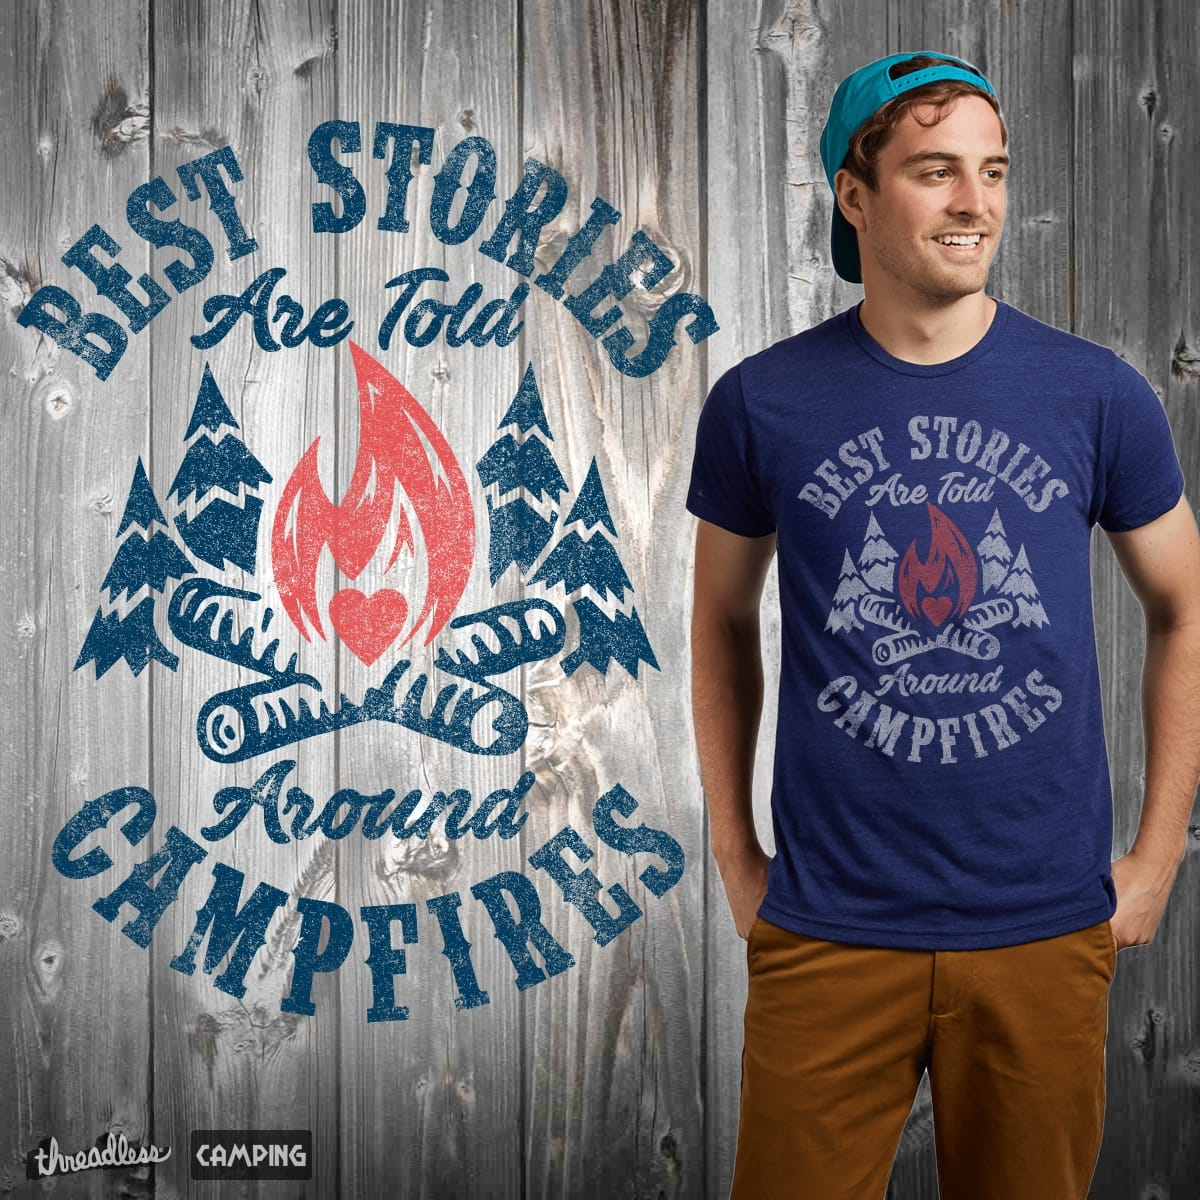 Campfire Stories by MackStudios on Threadless